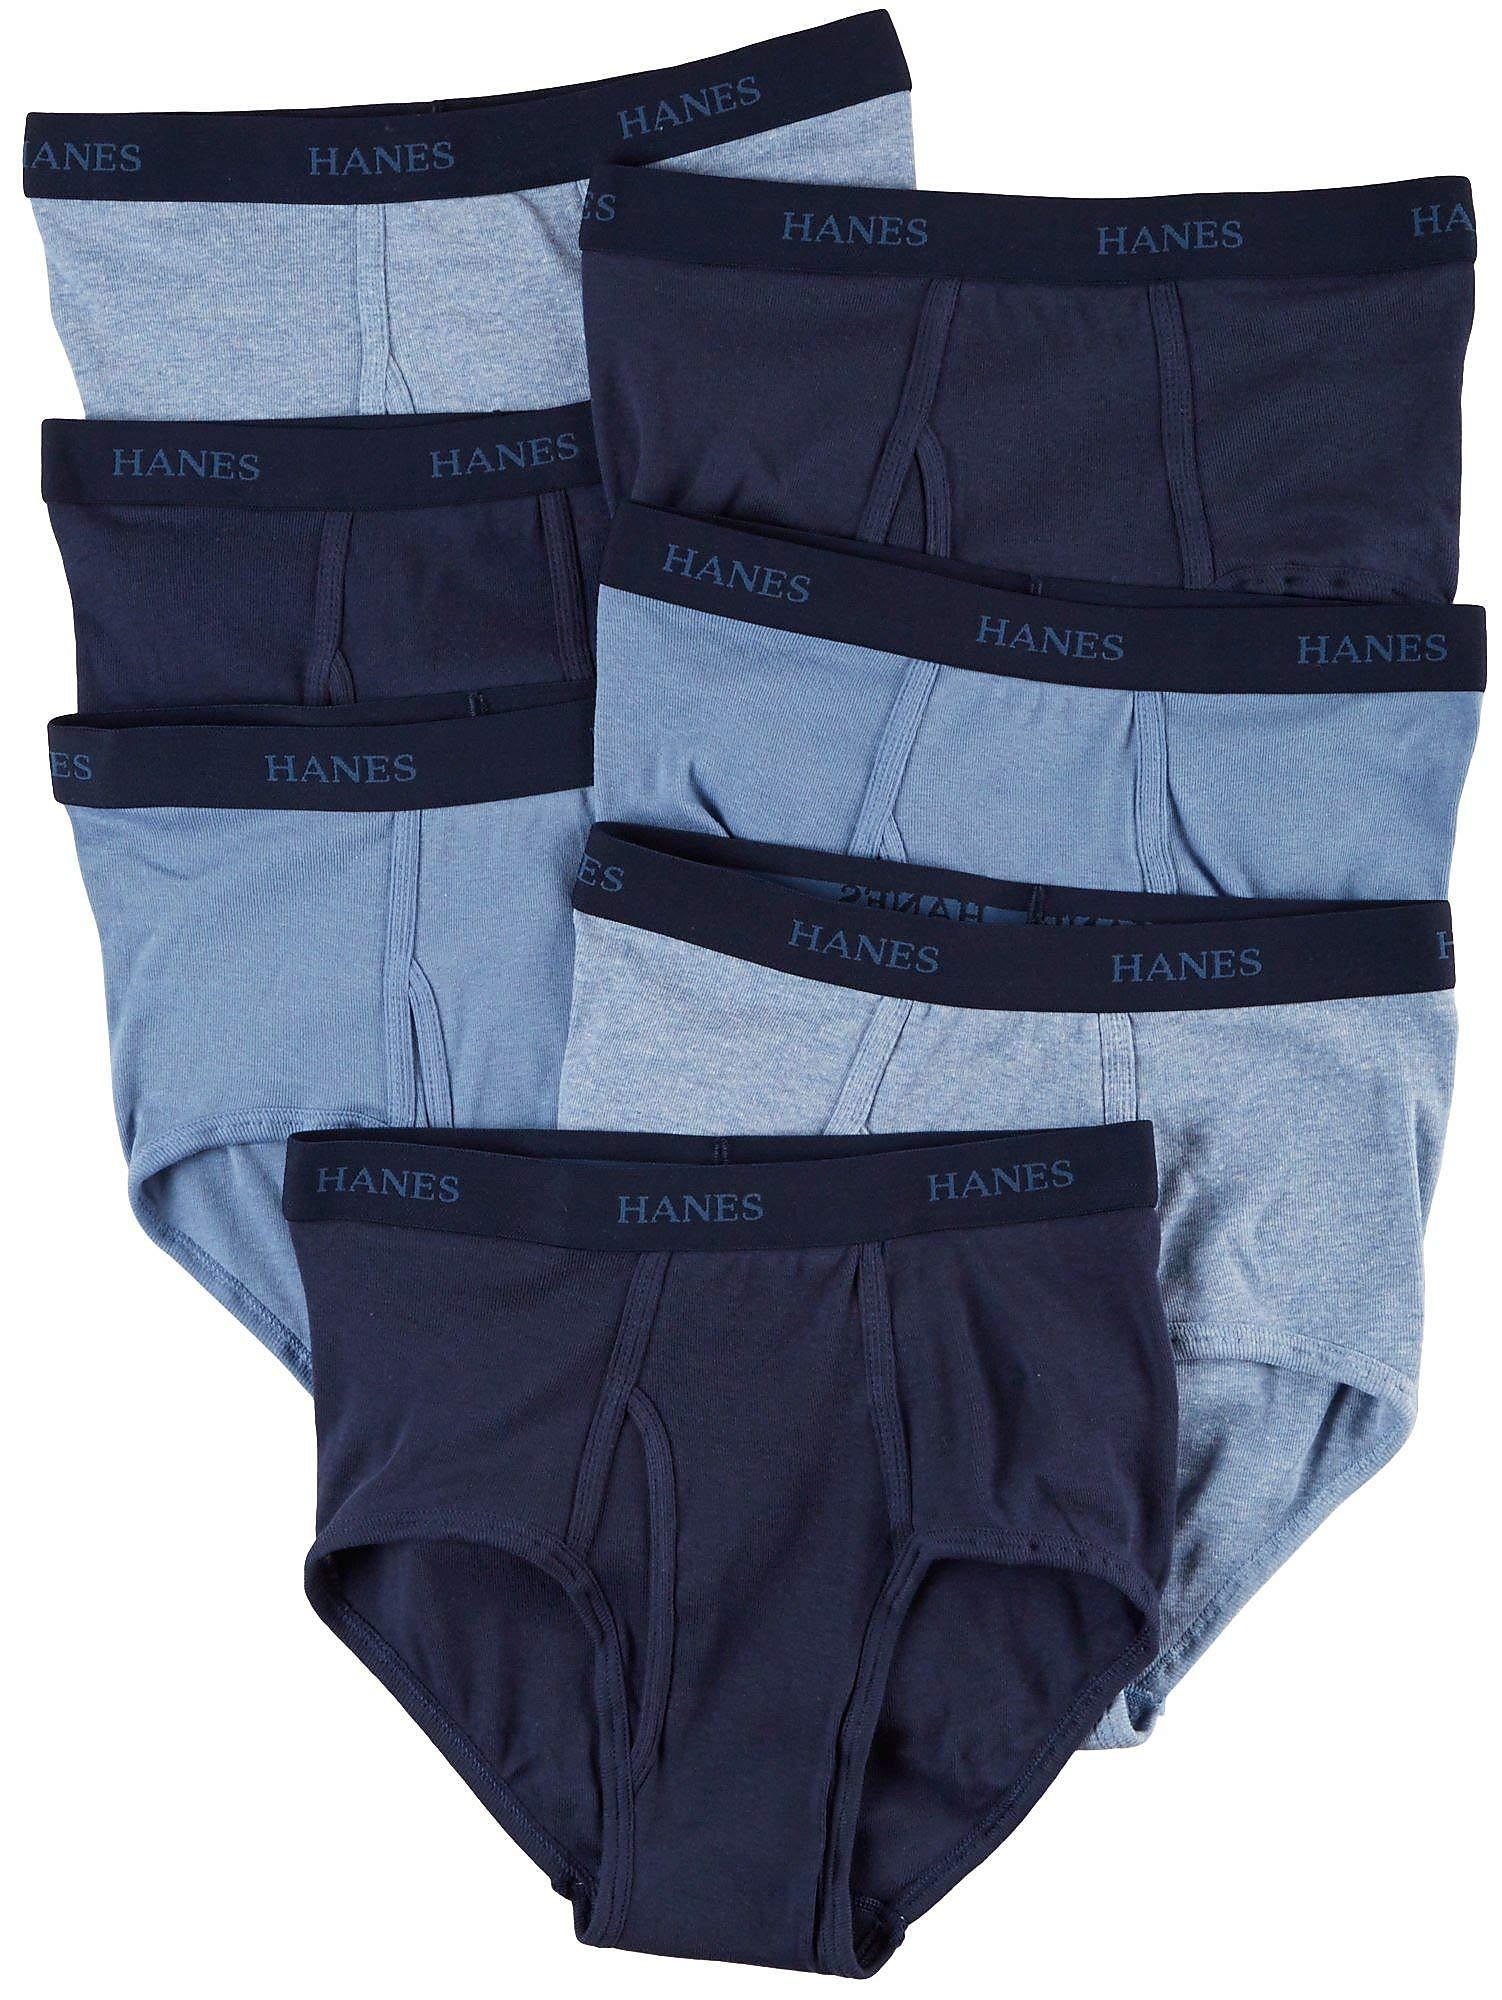 Hanes Ultimate Men's 7-Pack FreshIQ Full-Cut Briefs